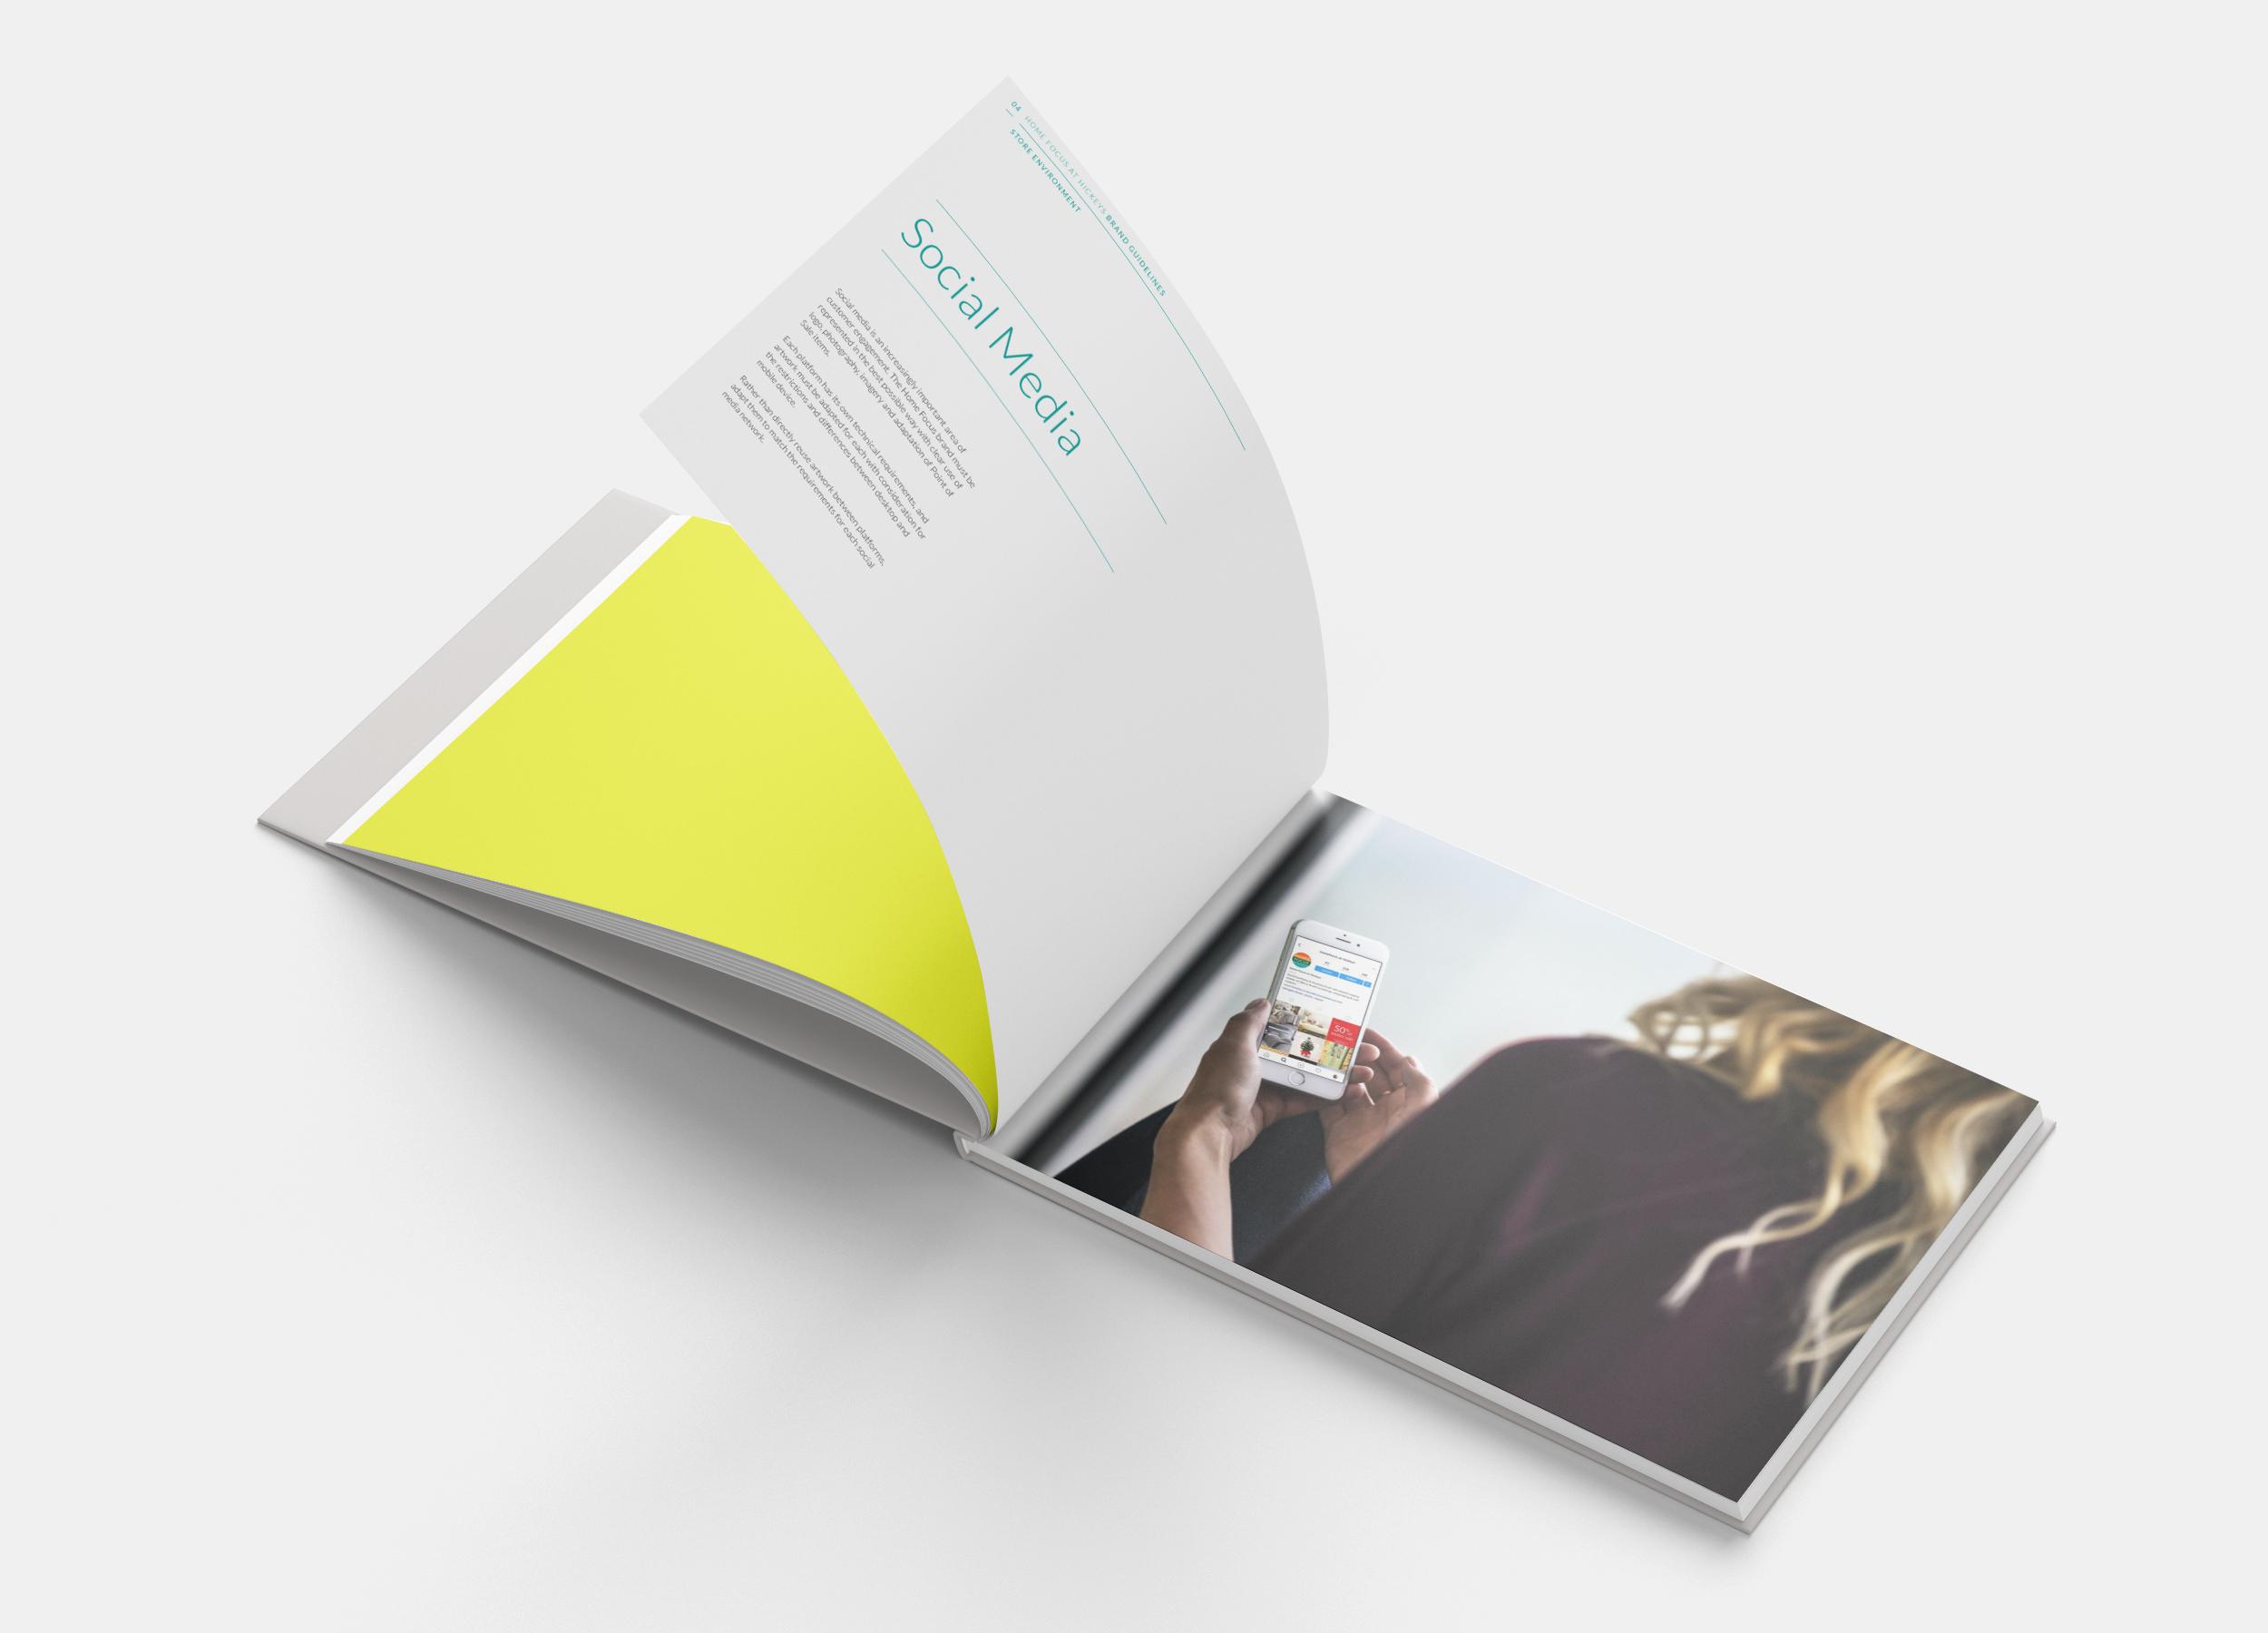 Horizontal_Book_Mockup_5.jpg